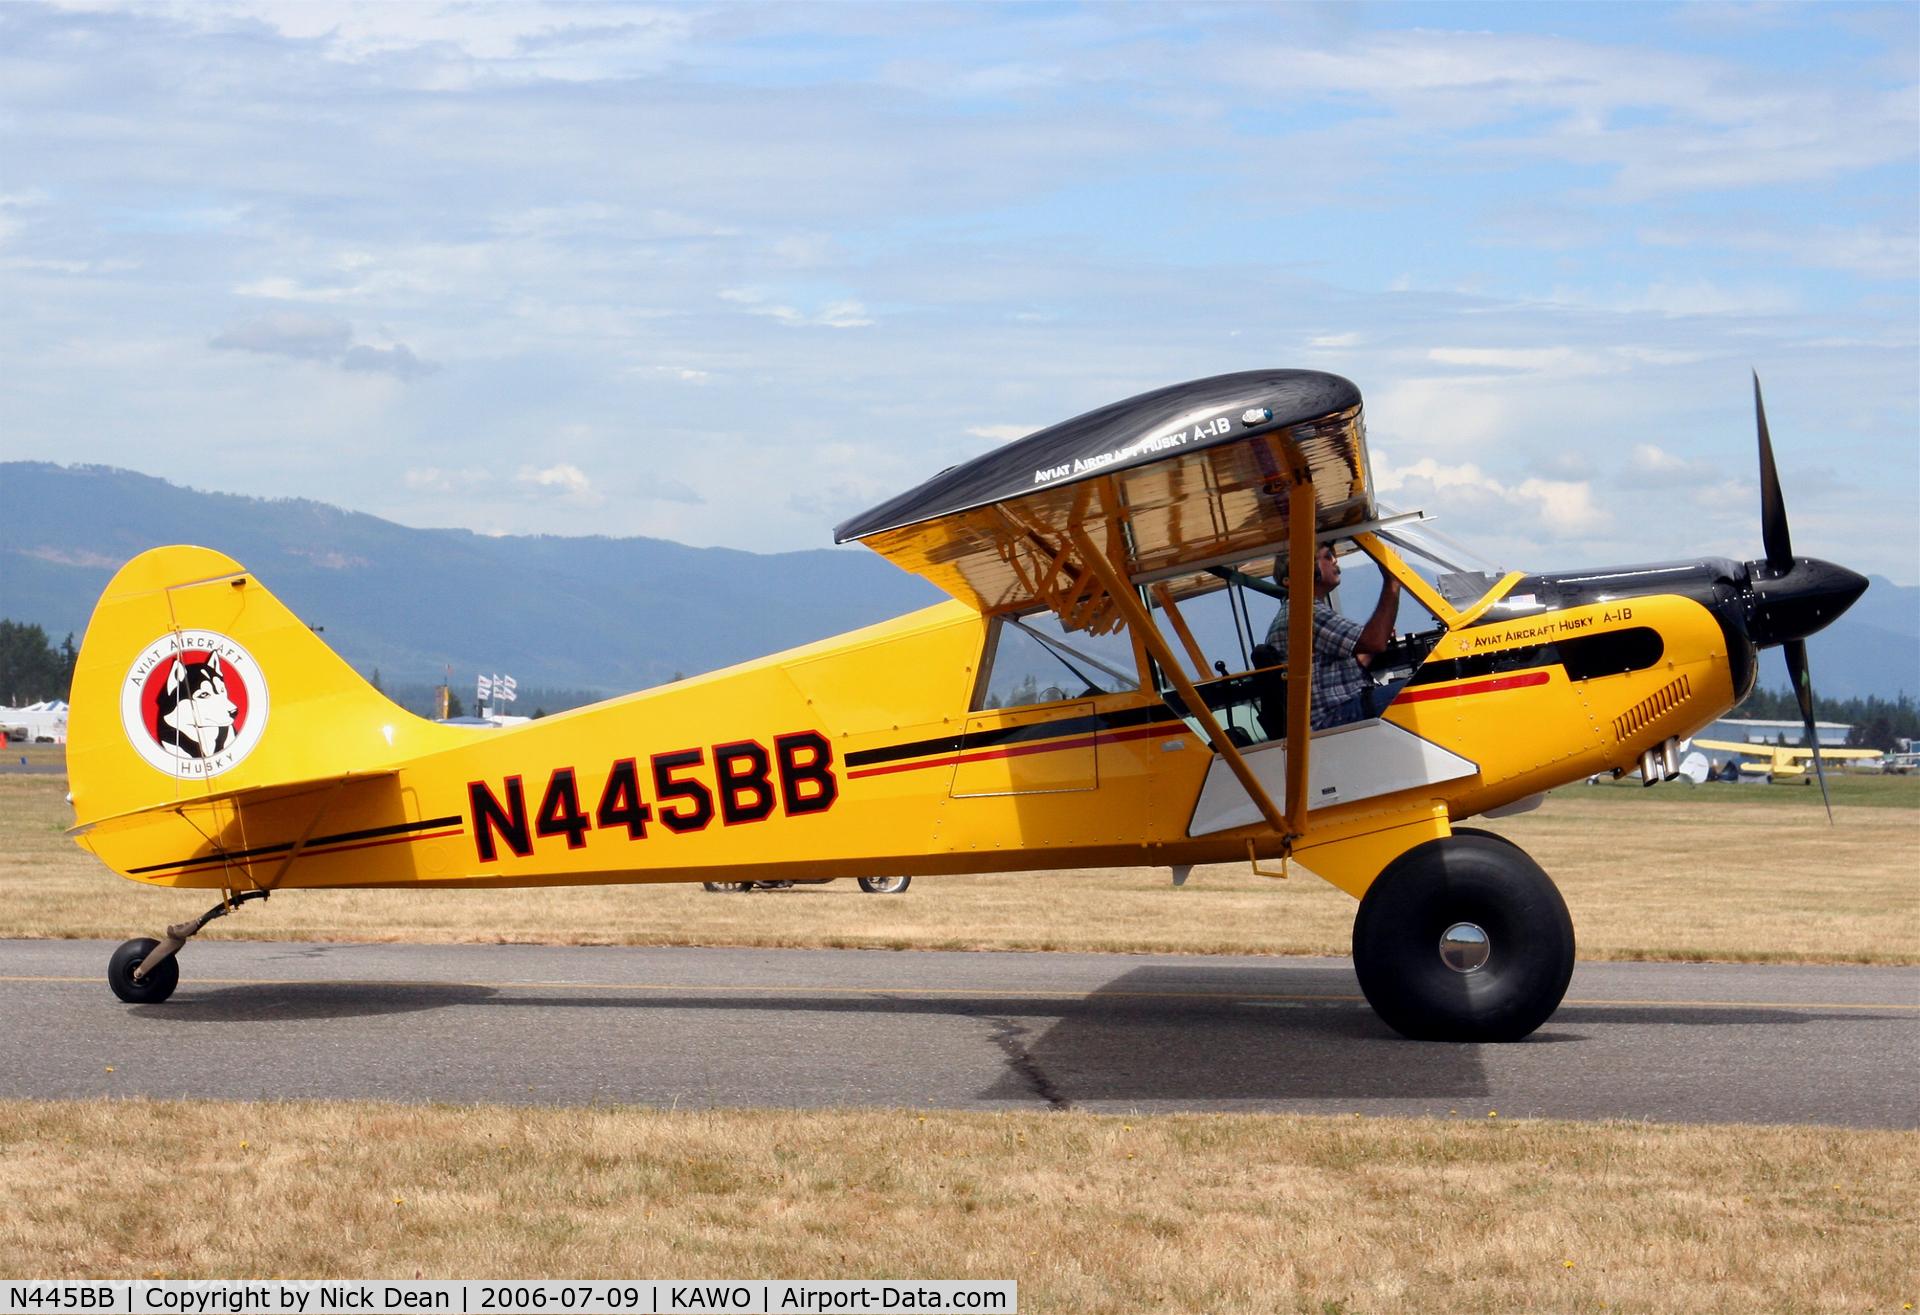 N445BB, 2005 Aviat A-1B Husky C/N 2314, /